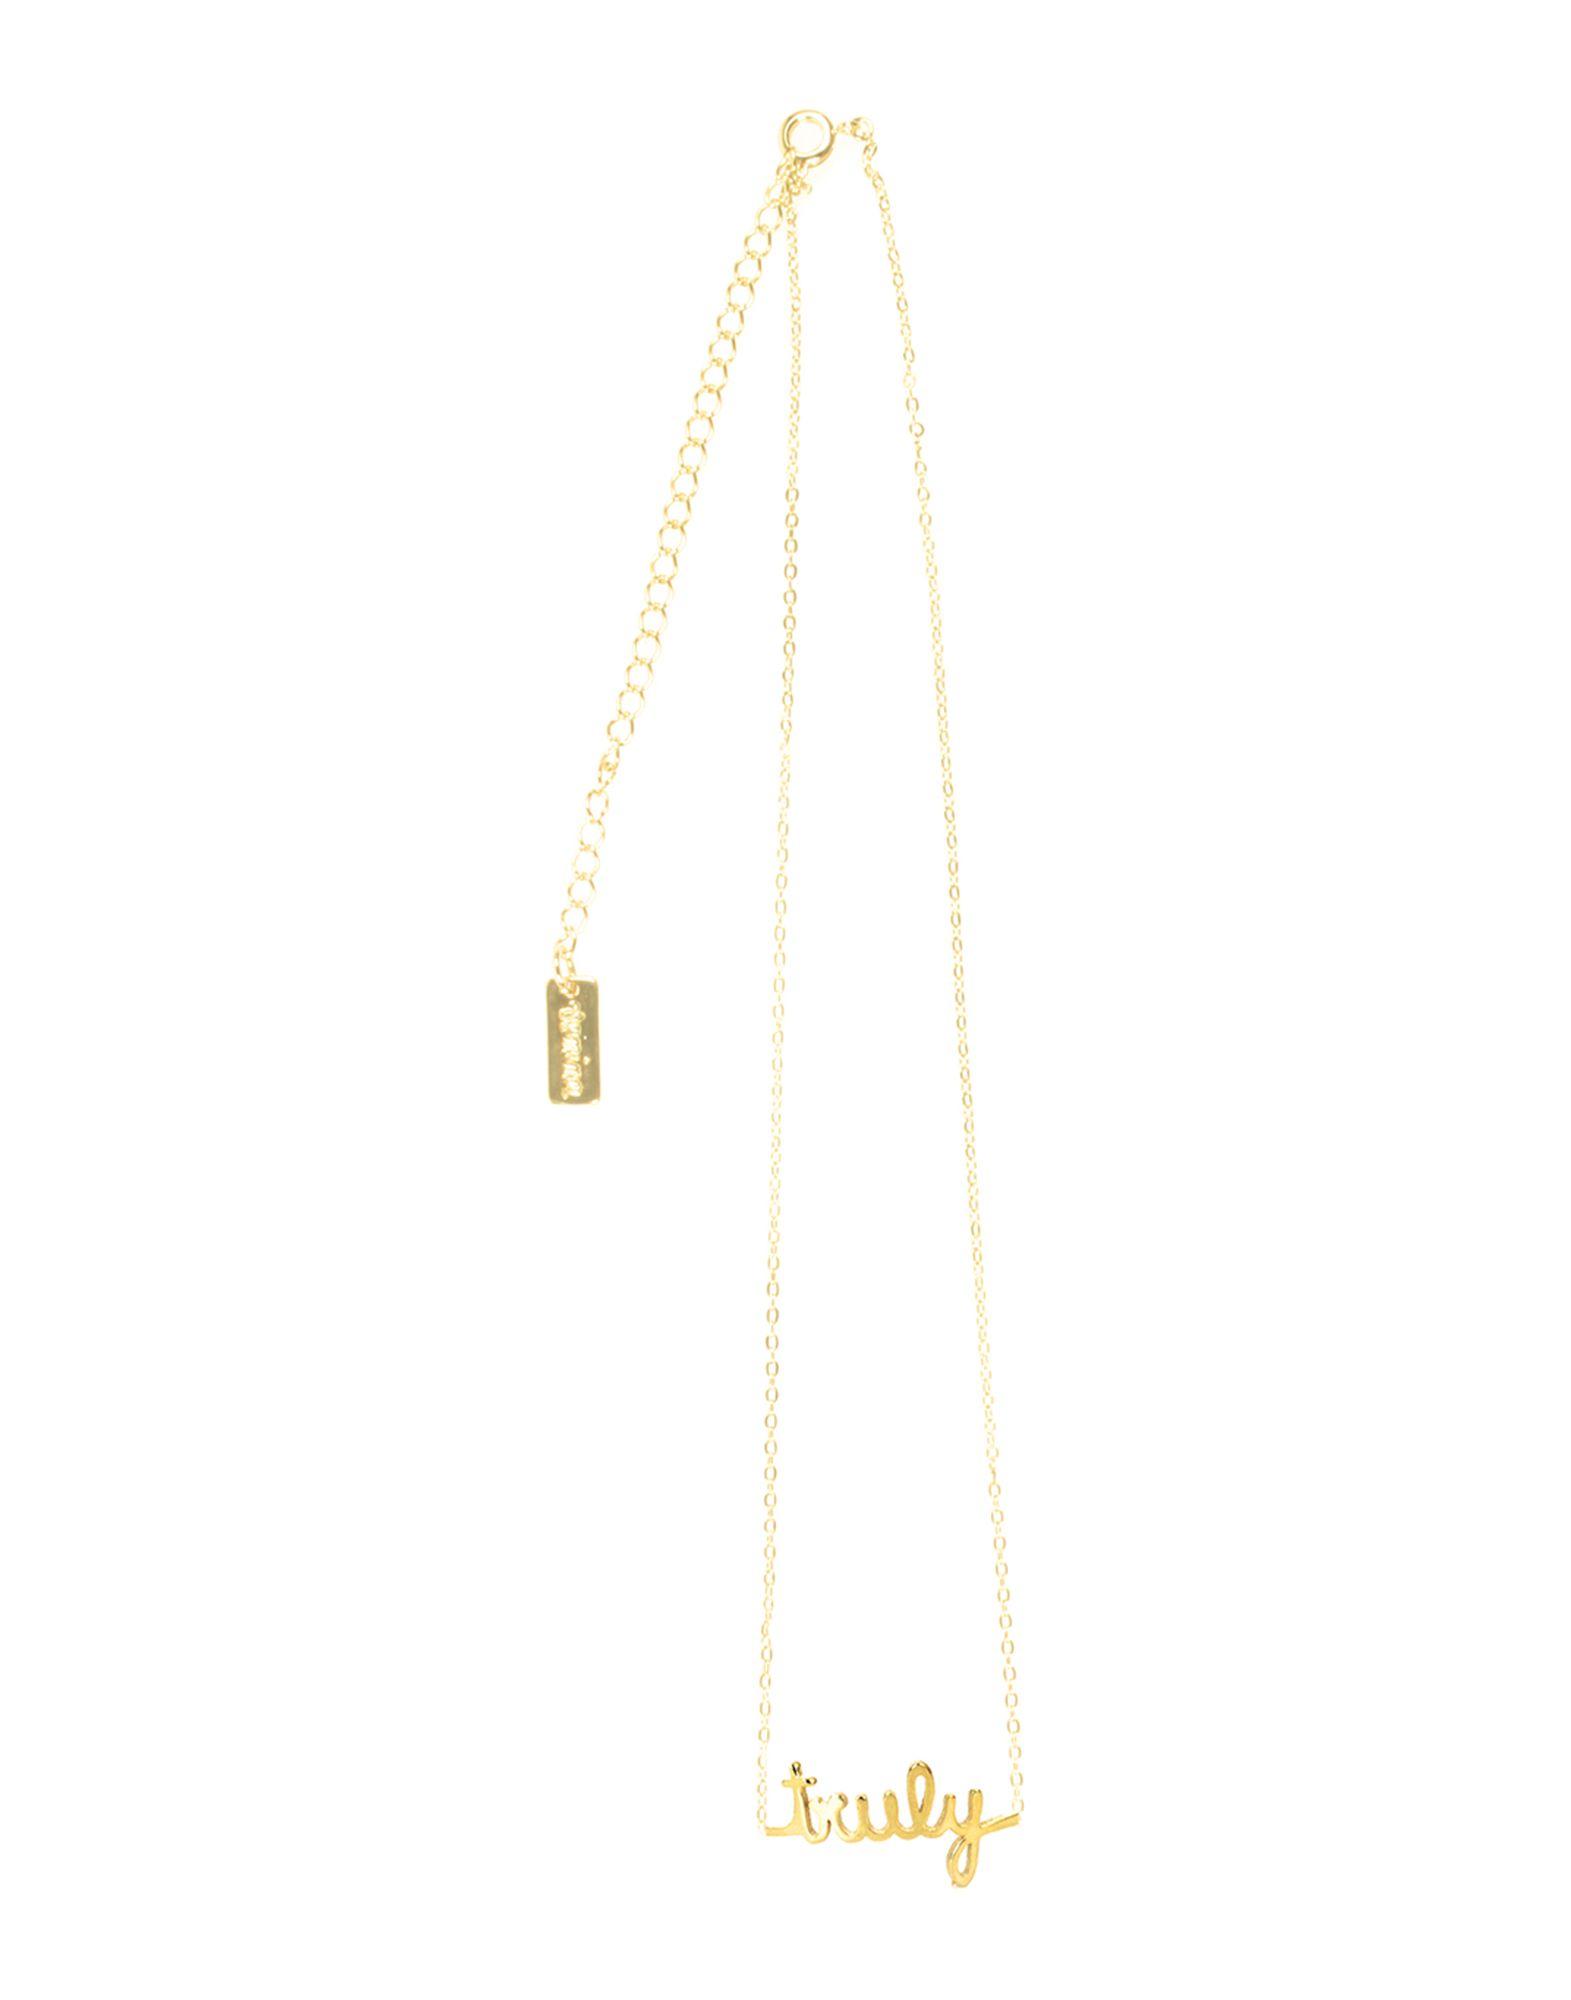 VANINA Necklace in Gold